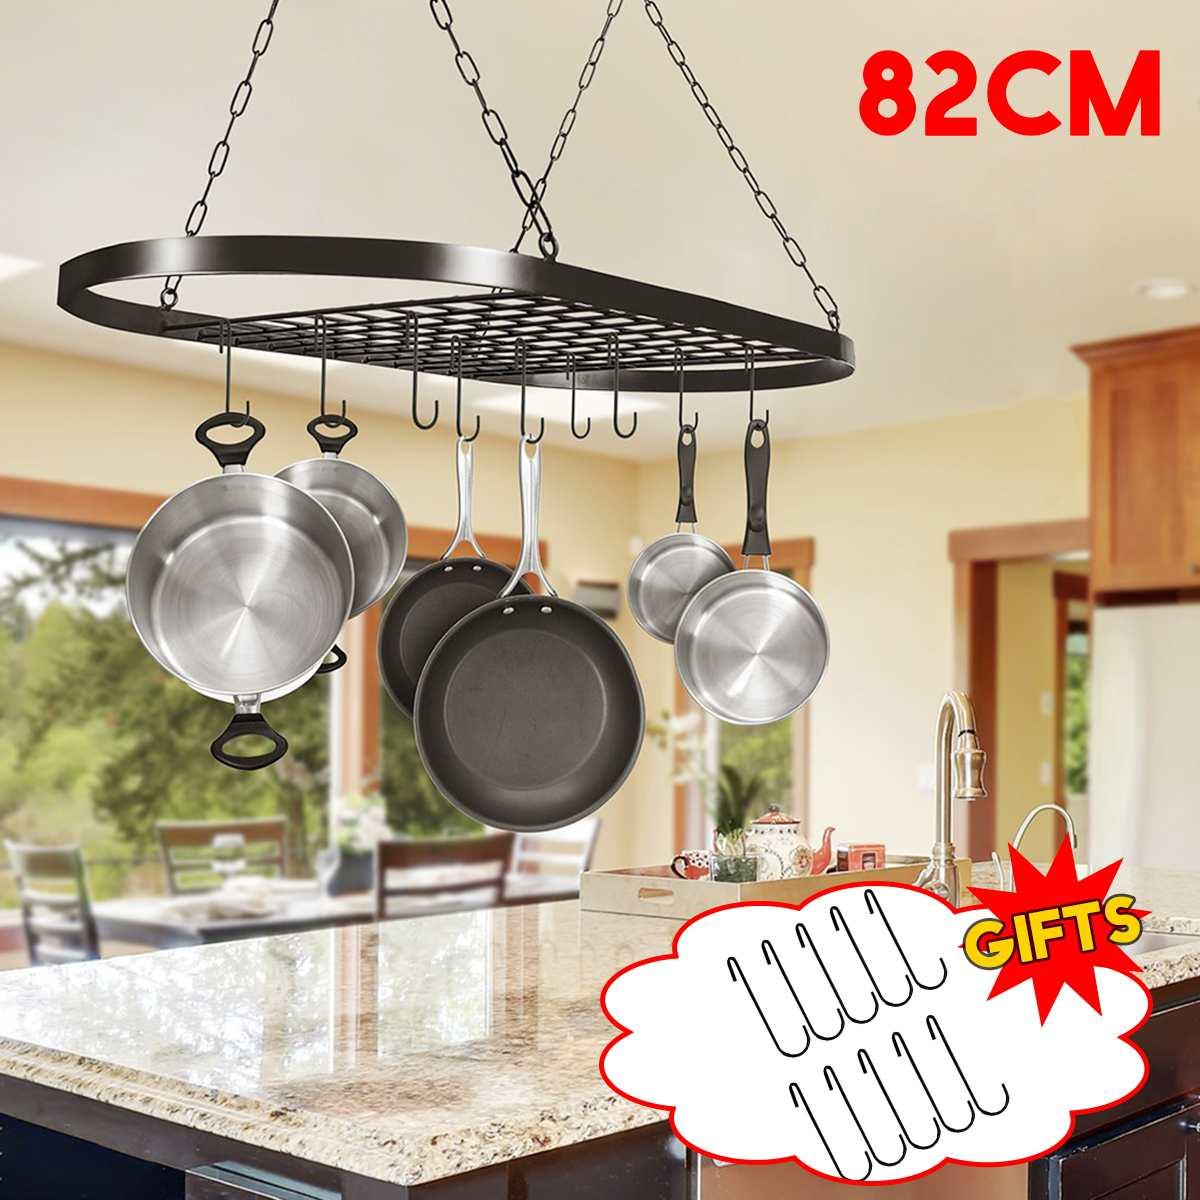 82x41x50cm Folding Hanging Iron Rack Storage Kitchen Organizer Pot Pan Ceiling Holder Shelf + 10 Hooks Racks & Holders     - title=